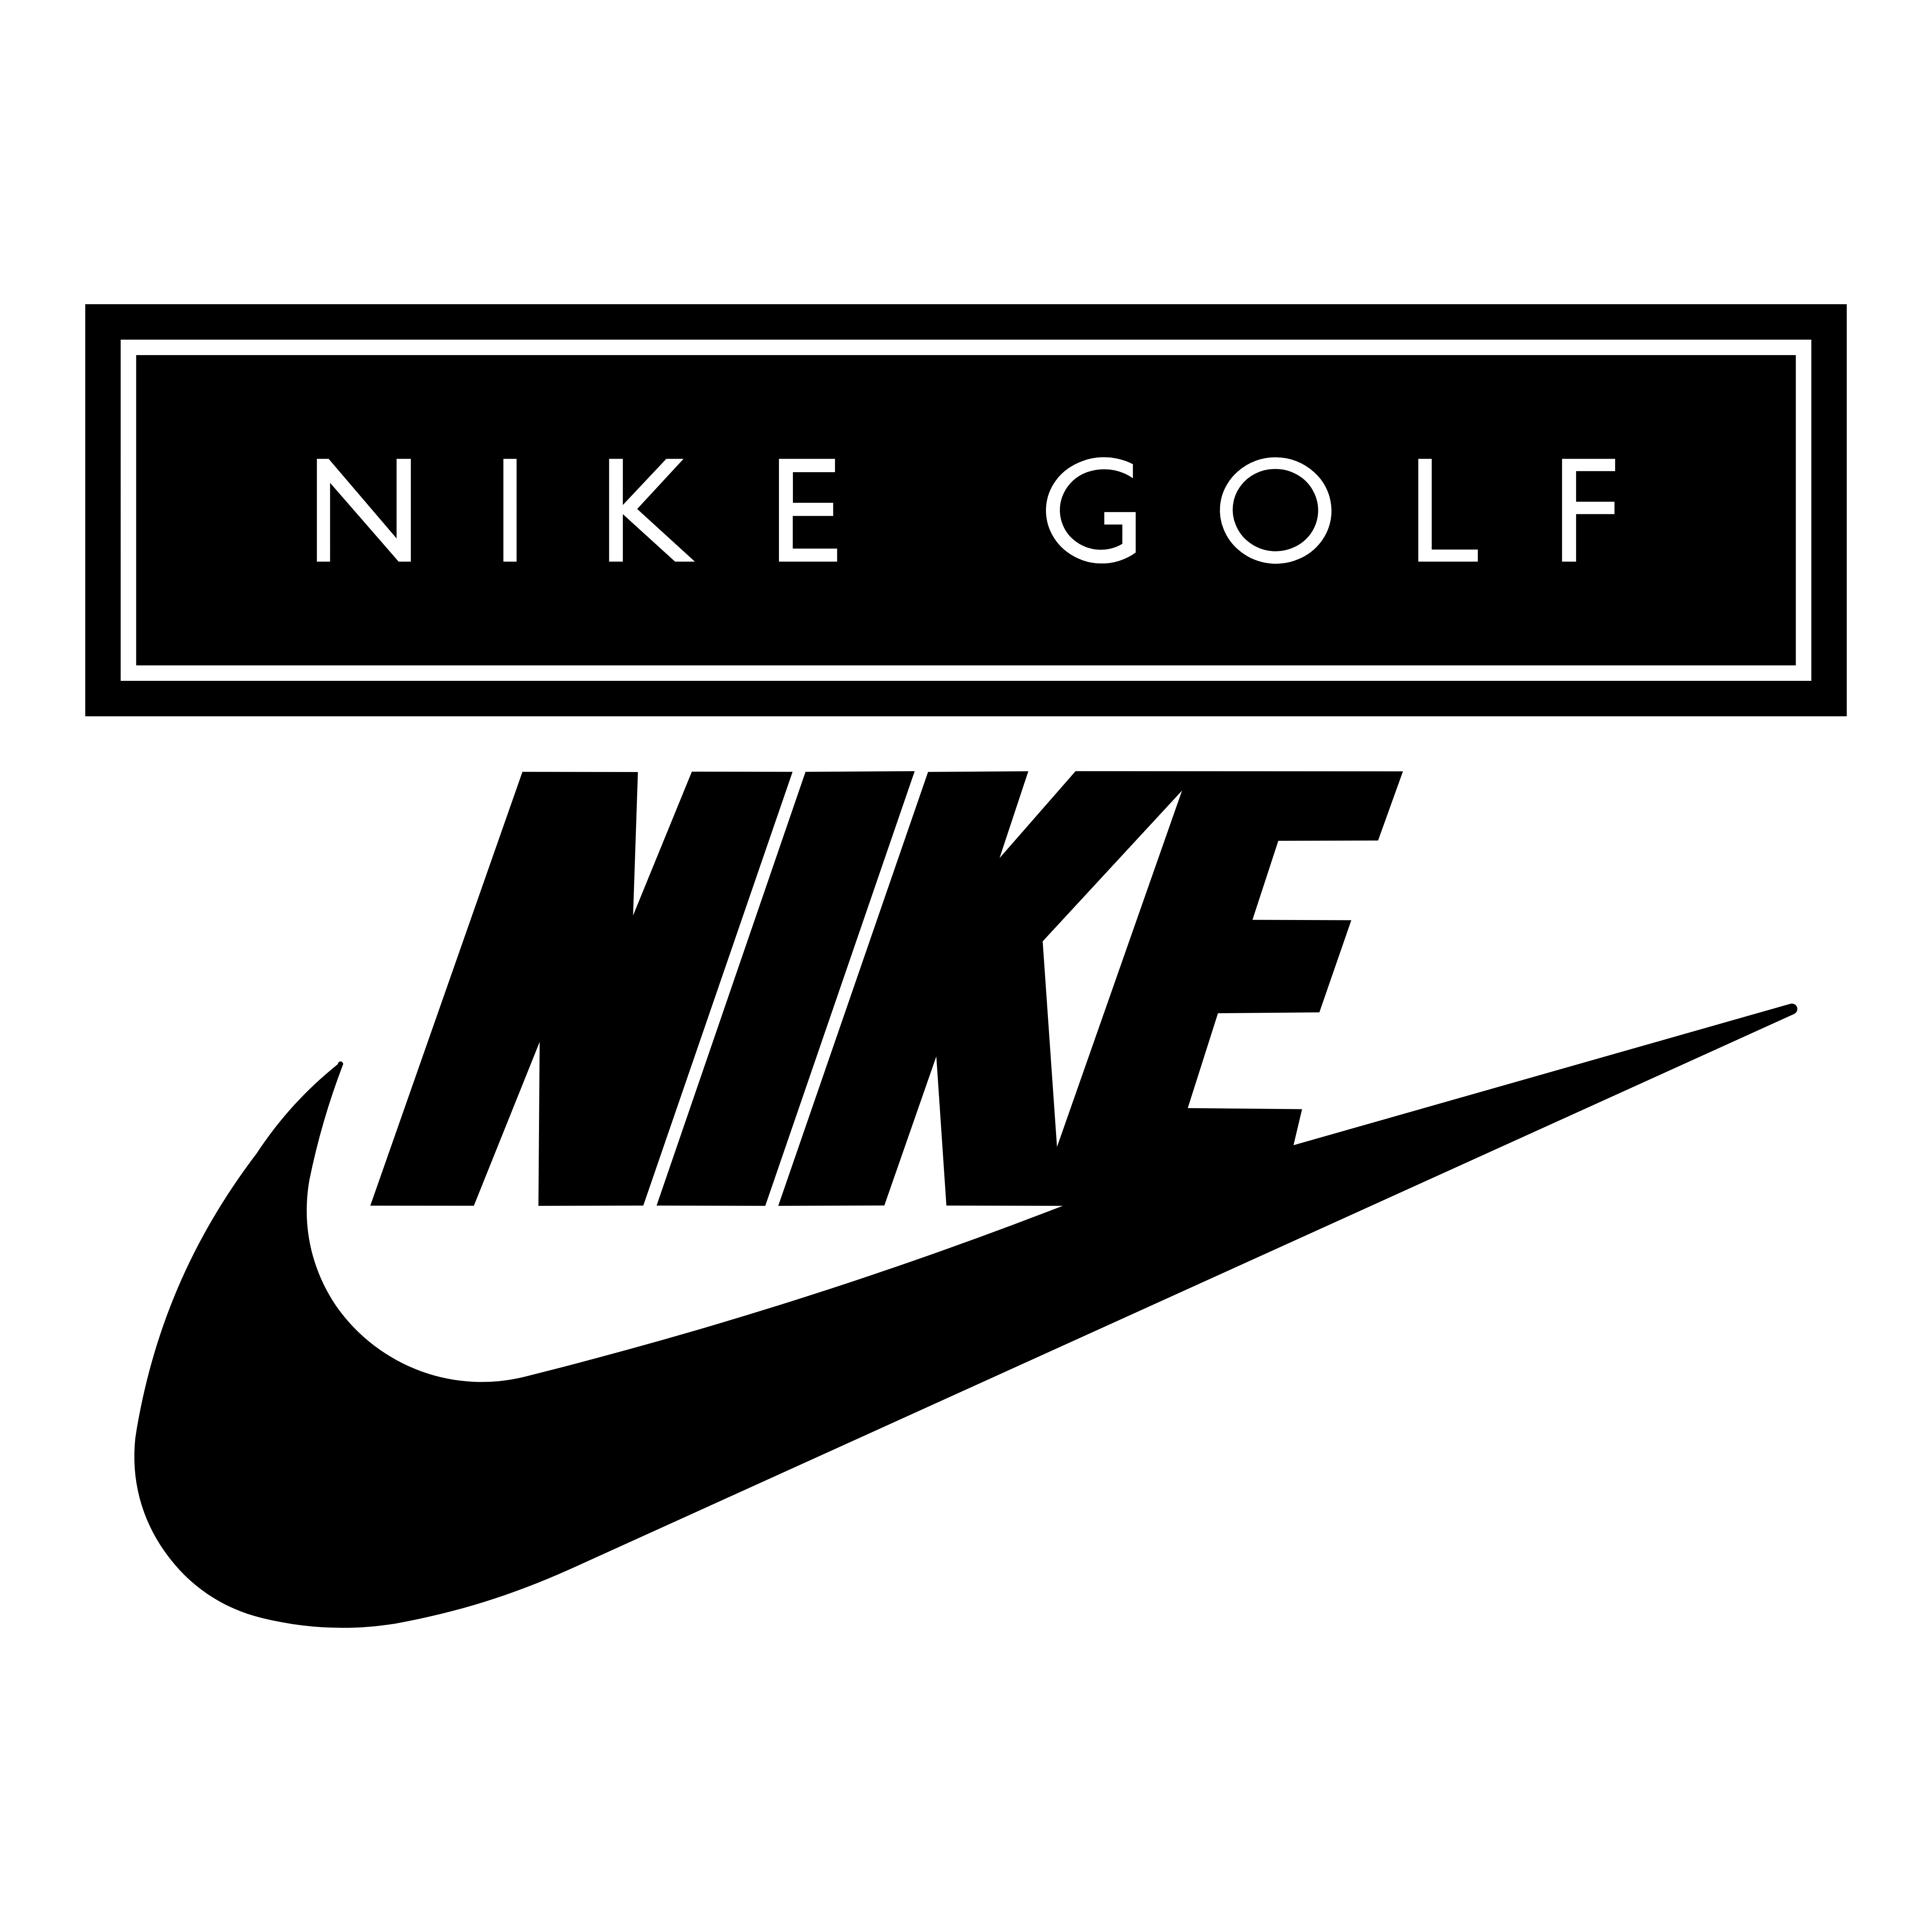 Nike Golf Logo download transparent